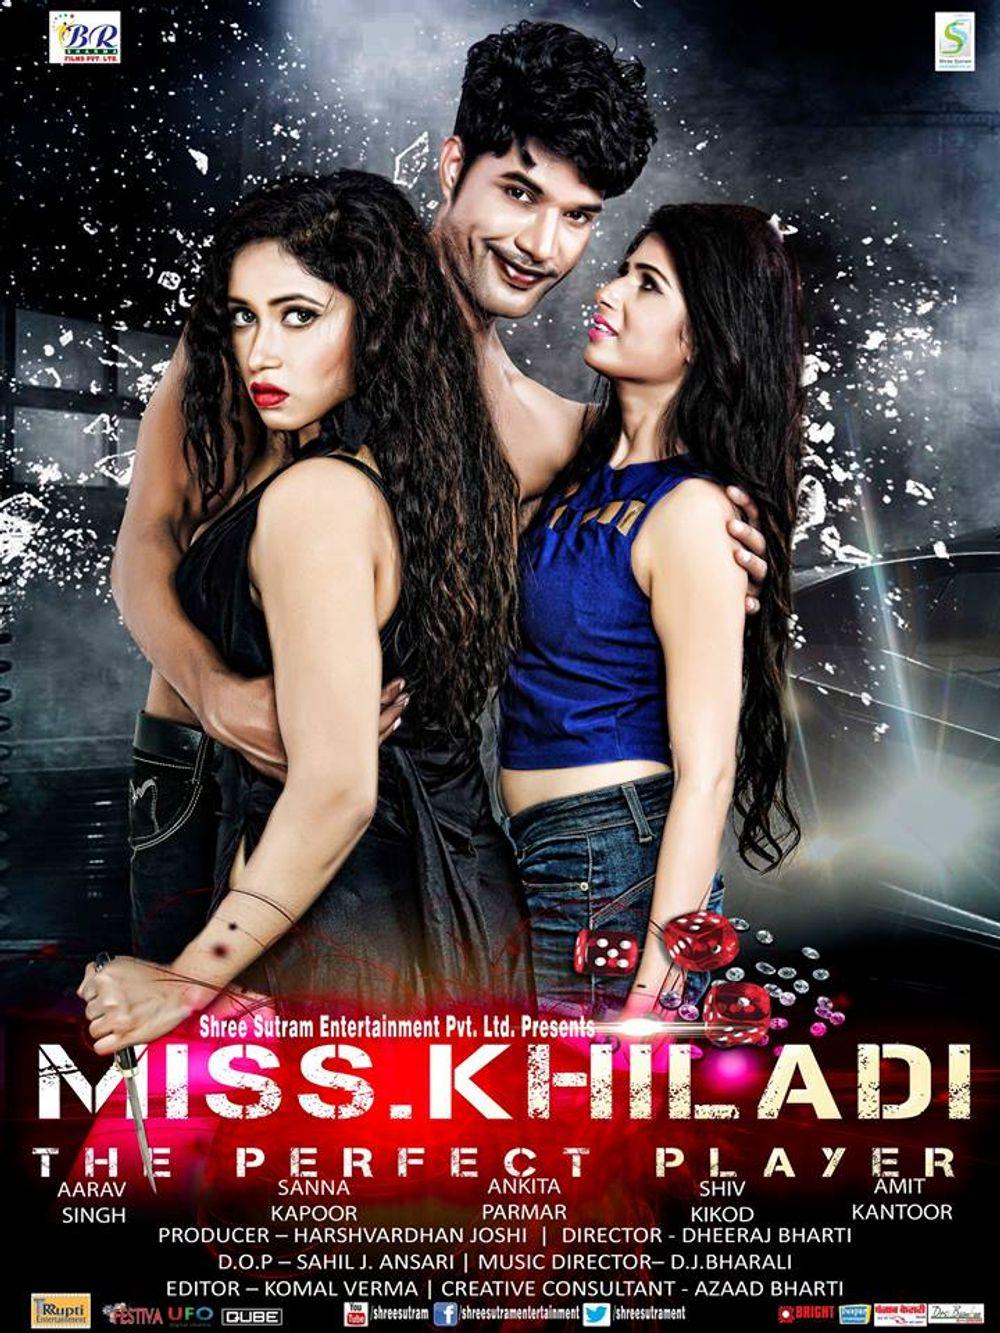 18+ Miss Khiladi-The Perfect Player 2021 Kooku Hindi 720p HDRip 990MB Download